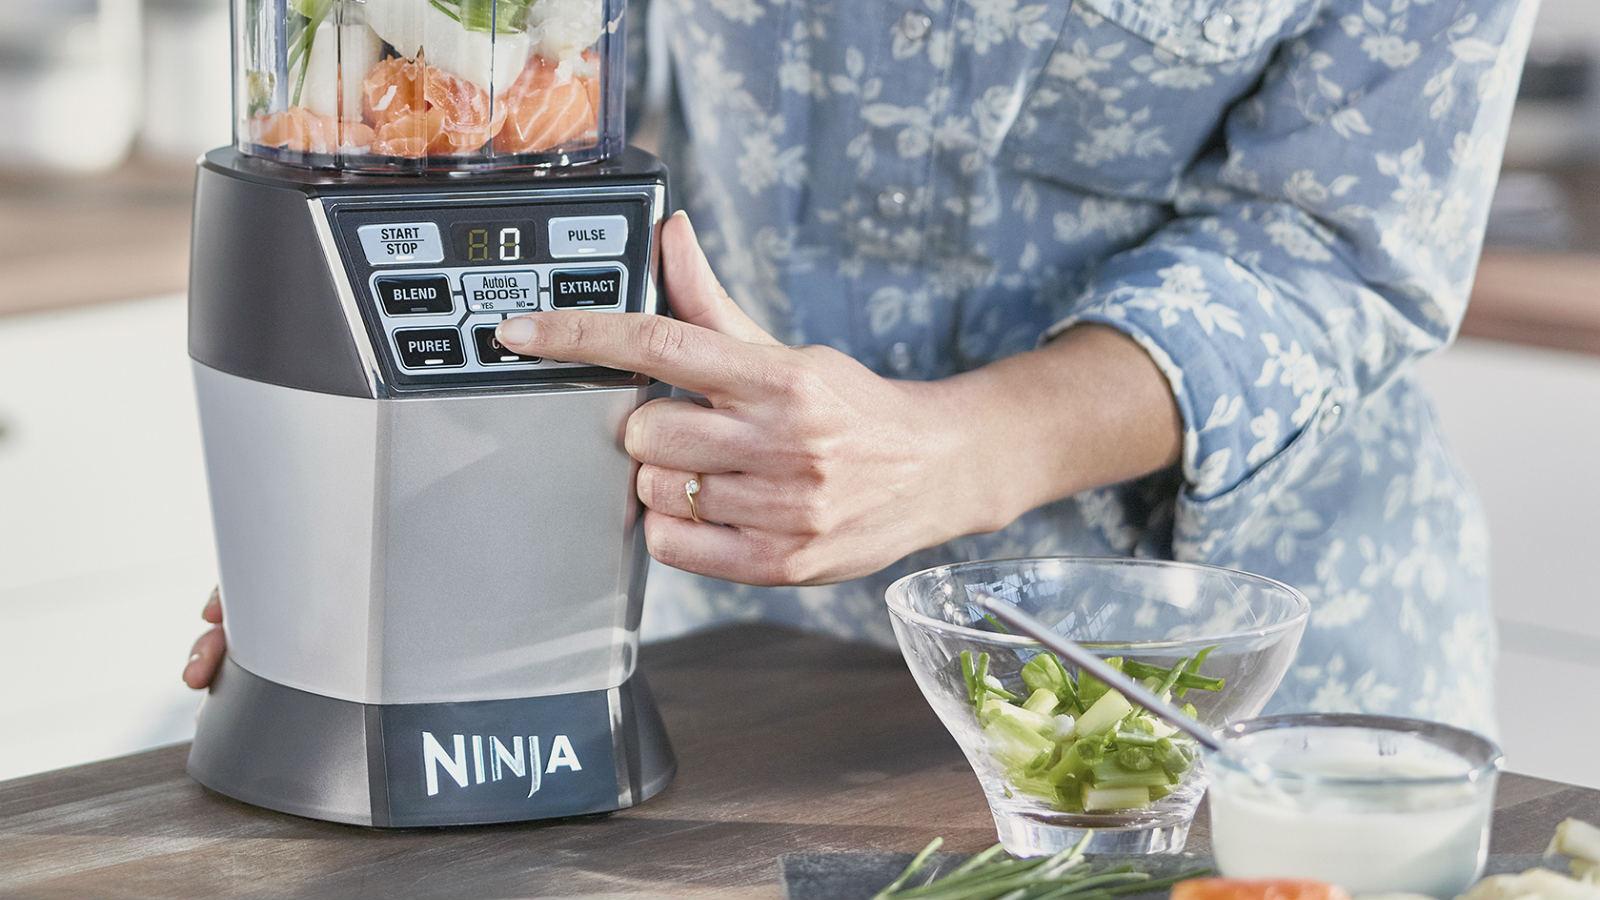 nn100uk-nutri-ninja-ninja-bowl-duo-1